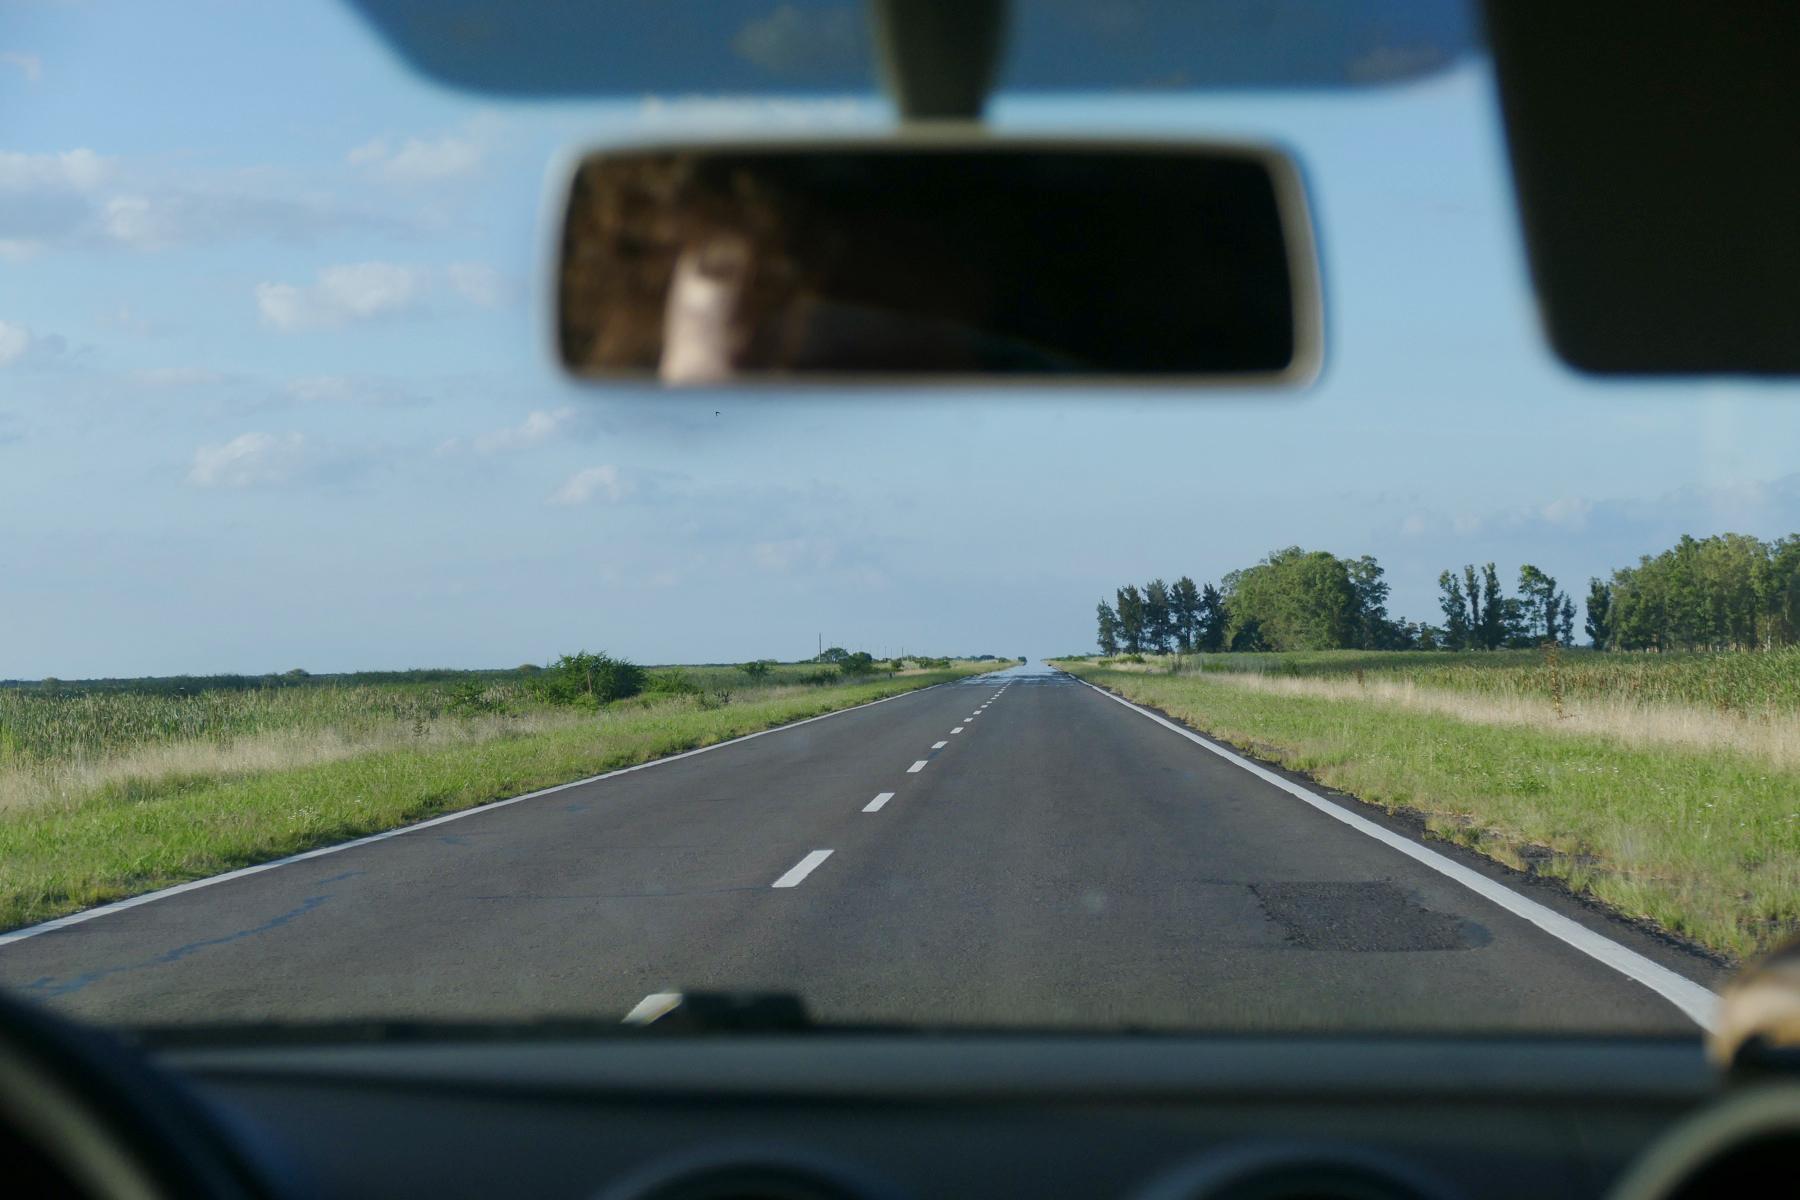 The wetlands of Entre Rios, seen through the windshield of Noah's rental car. Noah Strycker